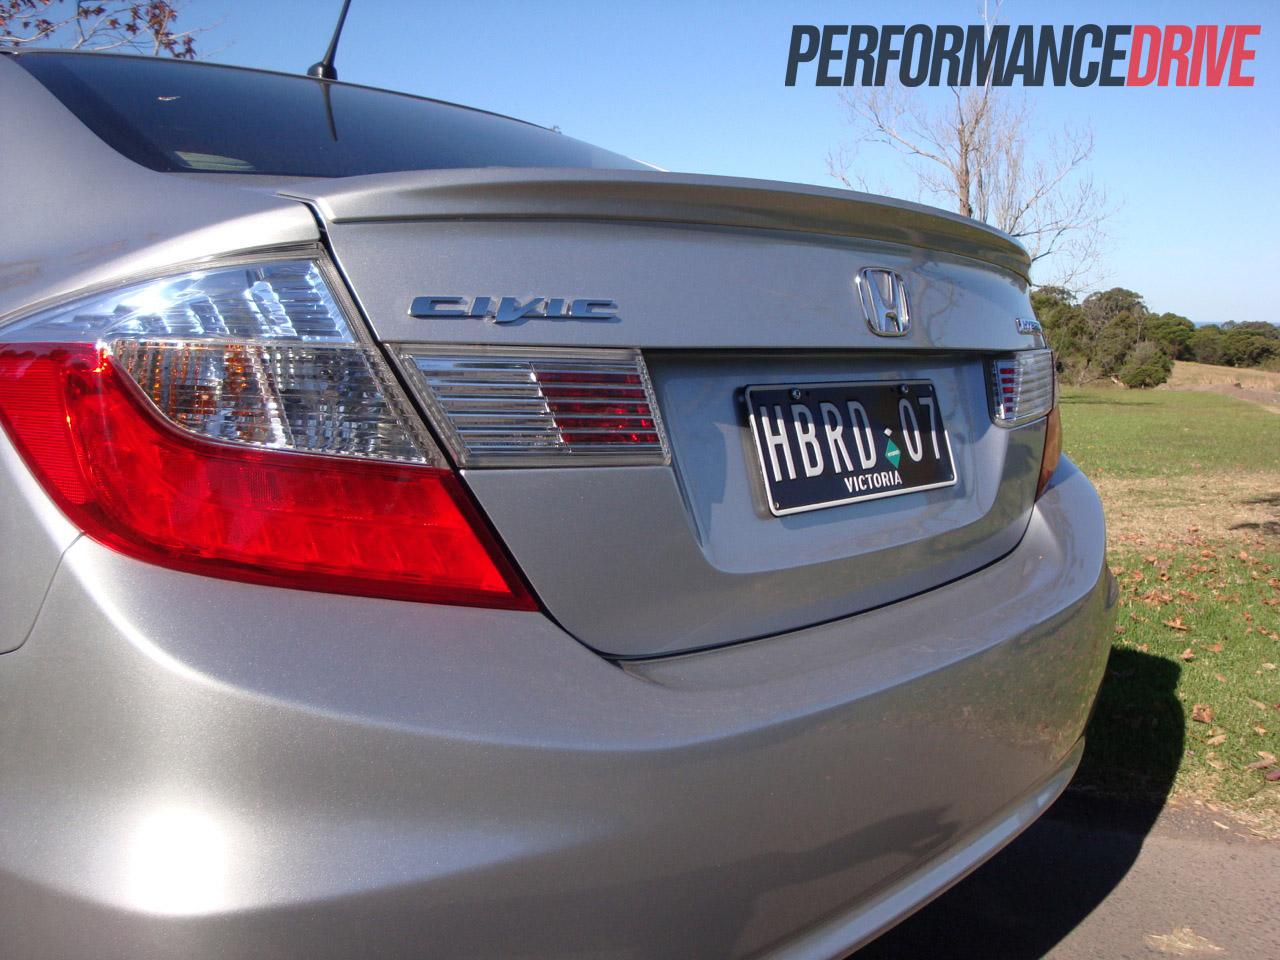 2012 Honda Civic Hybrid Rear Spoiler